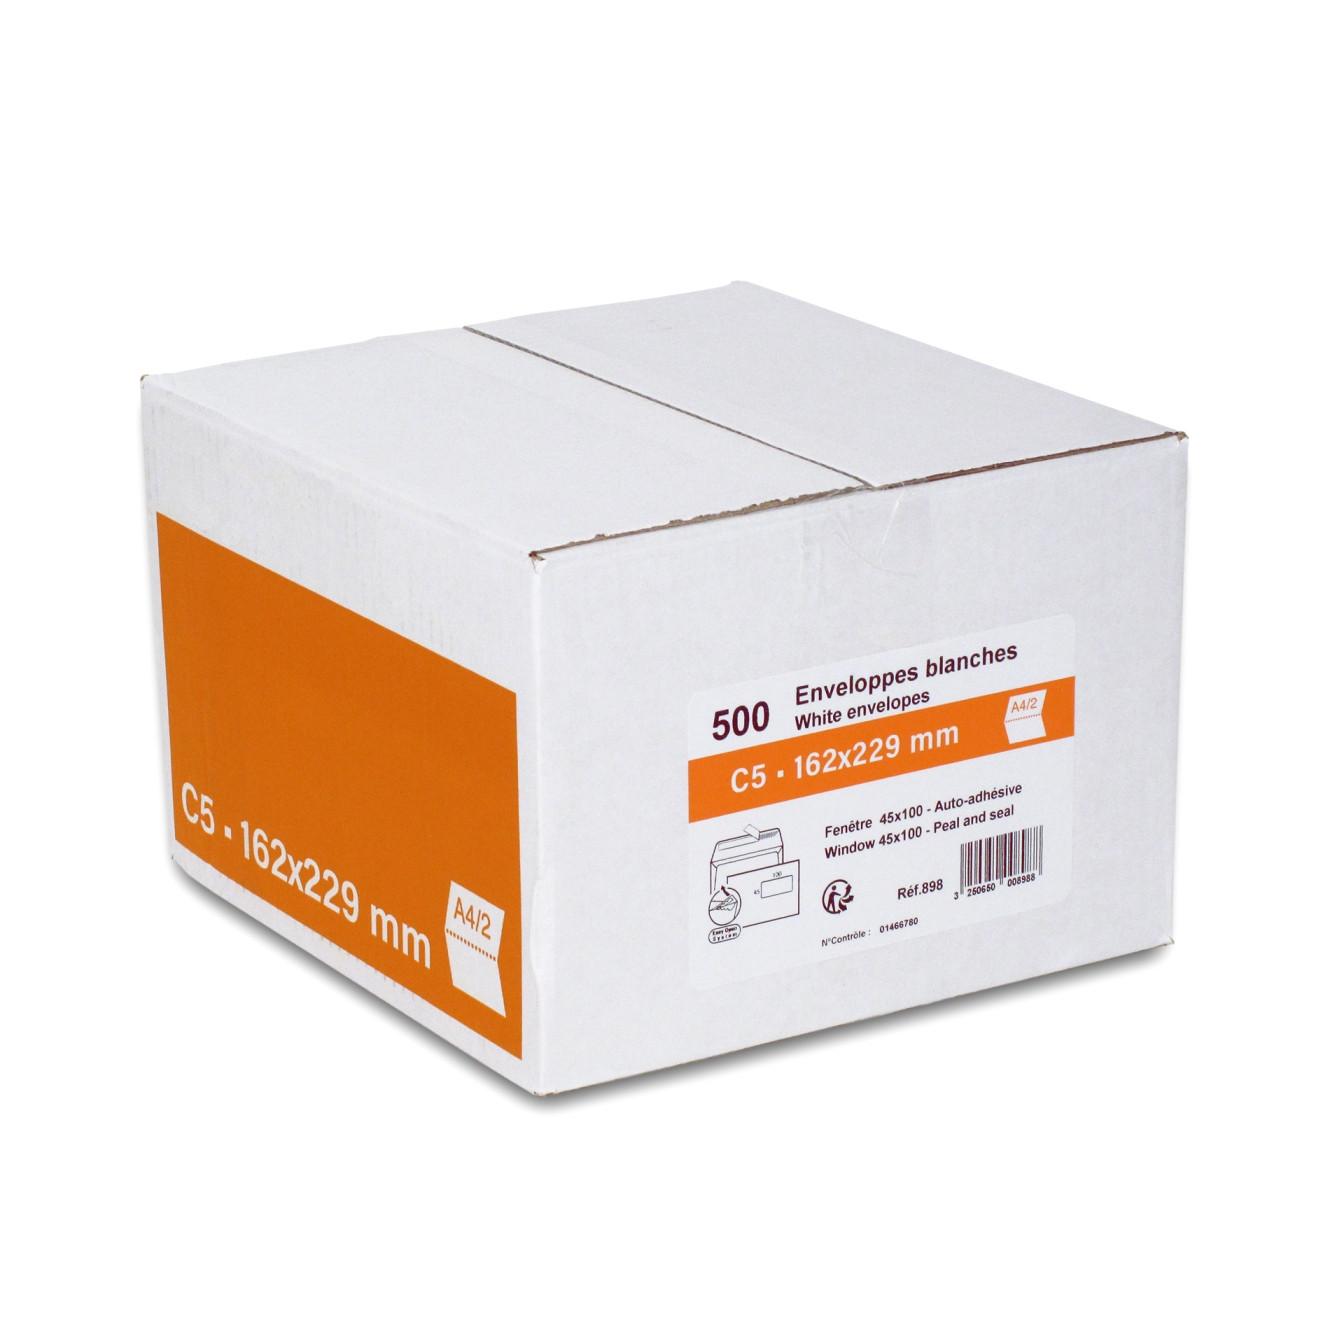 GPV - 500 Enveloppes C5 162 x 229 mm - 80 gr - fenêtre 45x100 mm - blanc - bande adhésive